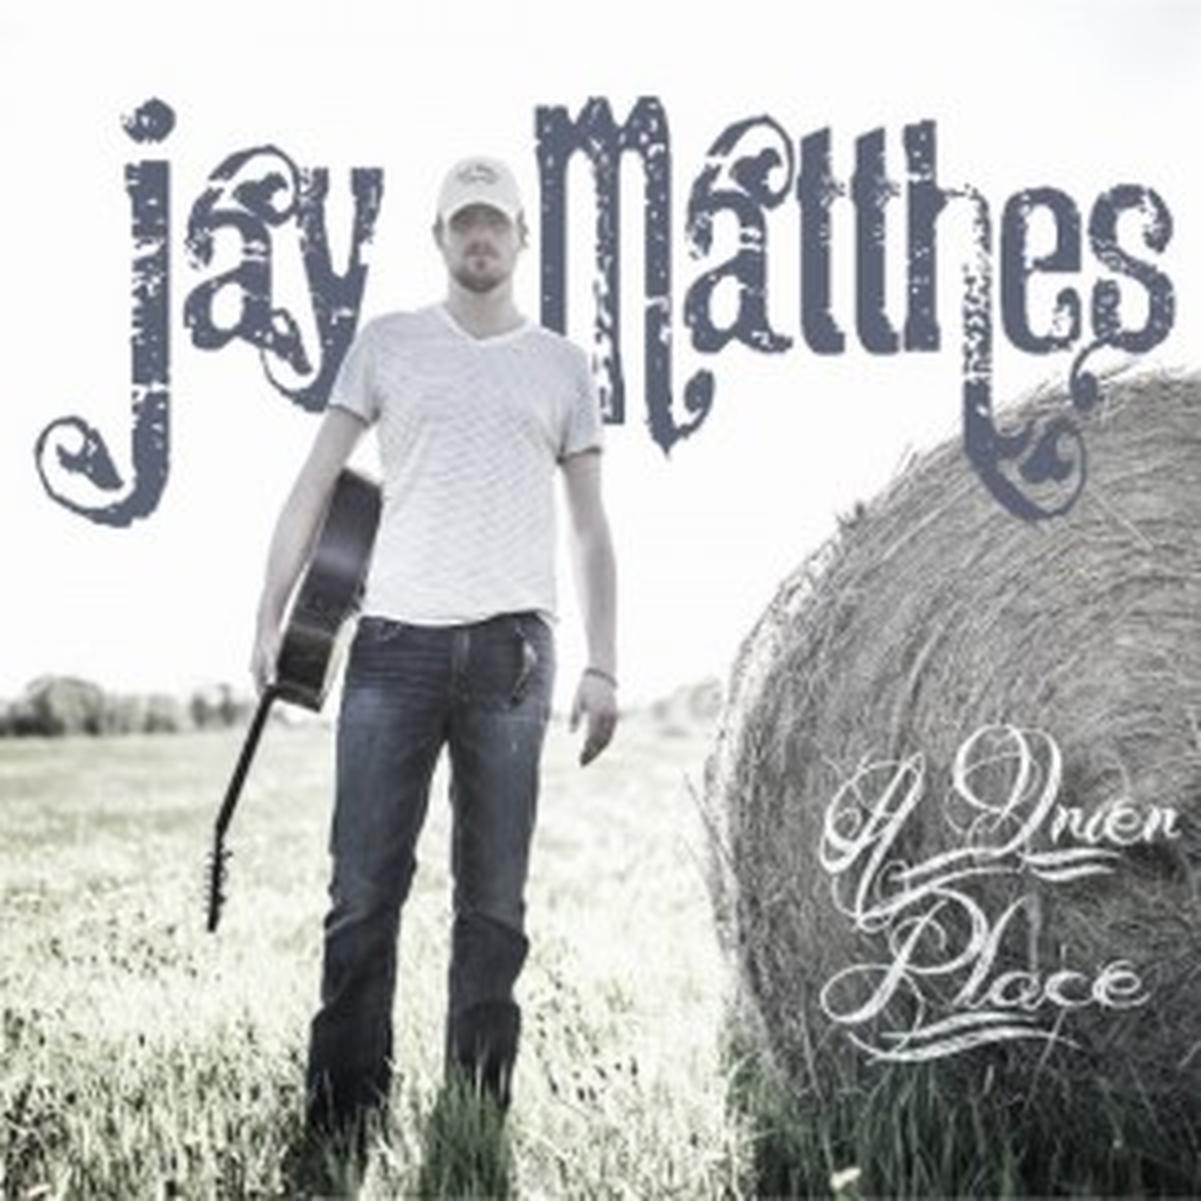 Jay Matthes wiki, Jay Matthes review, Jay Matthes history, Jay Matthes news